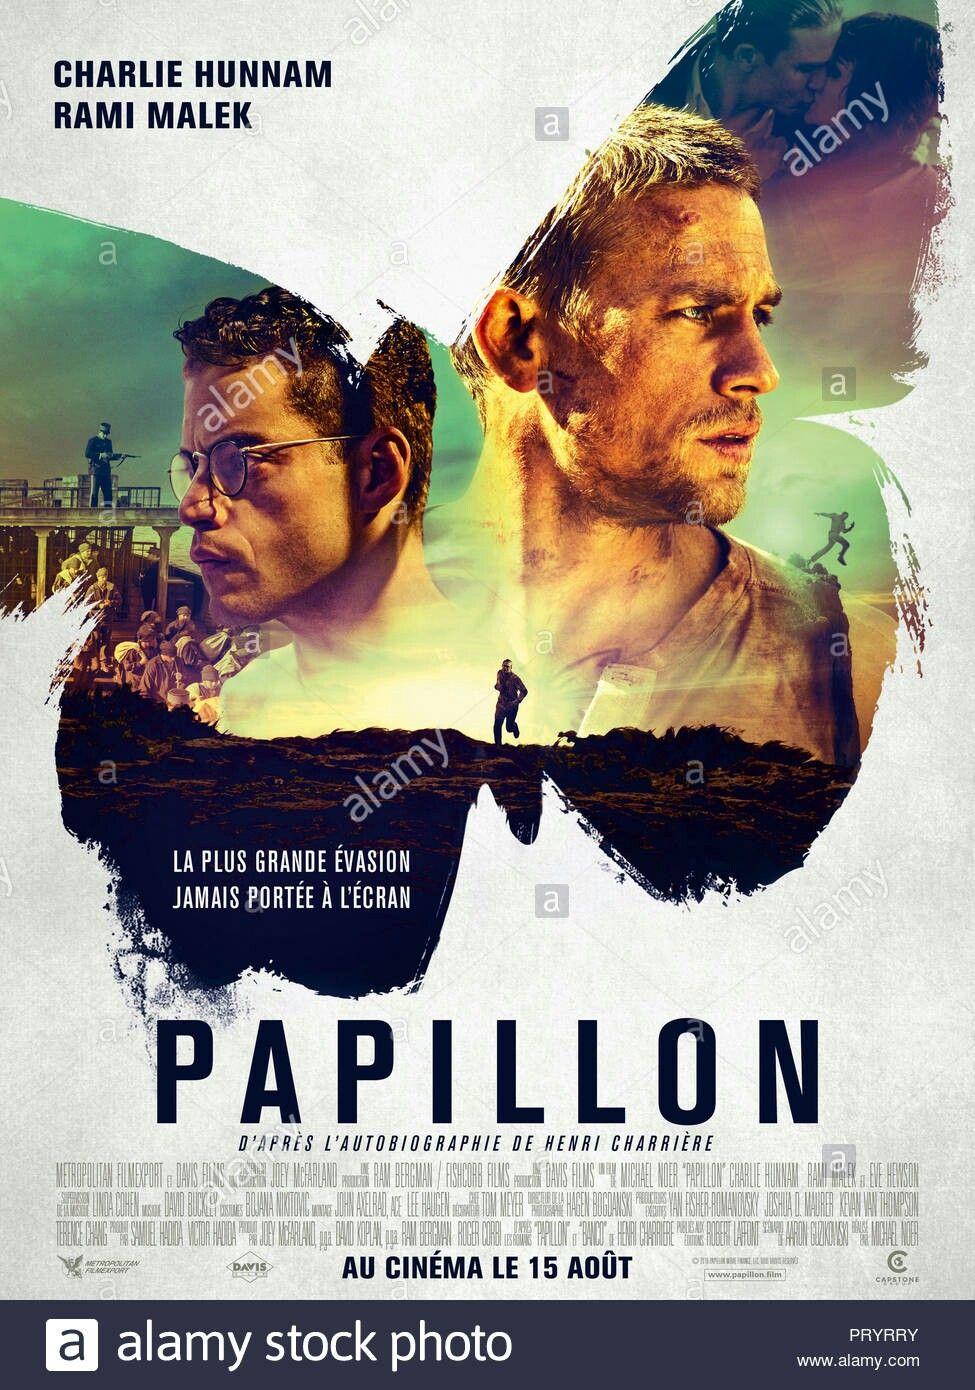 Papillon La Gran Fuga Papillon 2017 Una Buena Segunda Version De La Pelicula Papillon De 1973 Papillon Film Regarder Film Gratuit Film